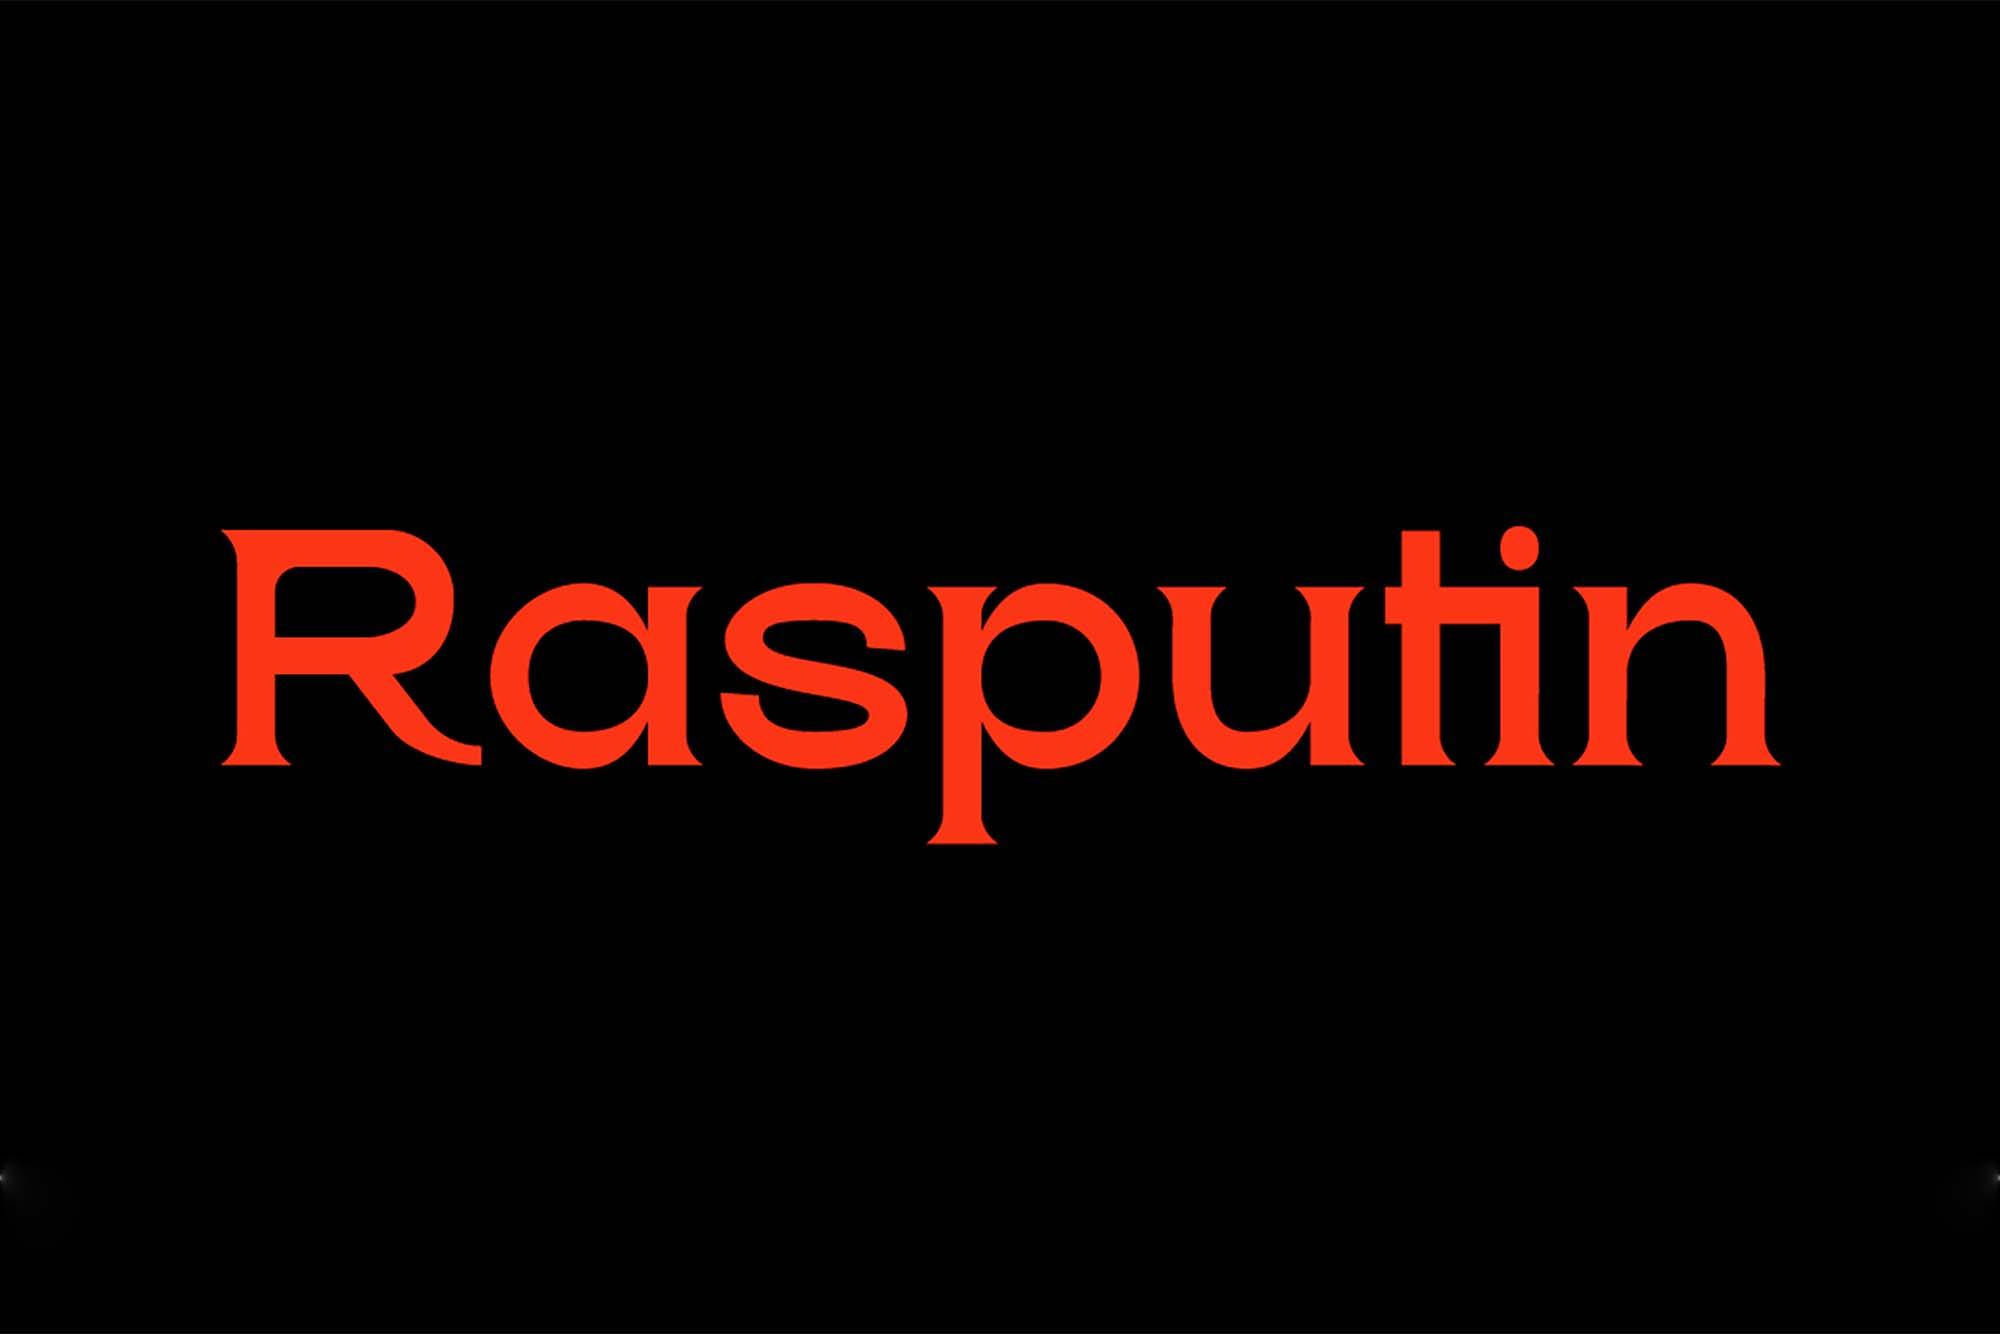 Rasputin Serif Font